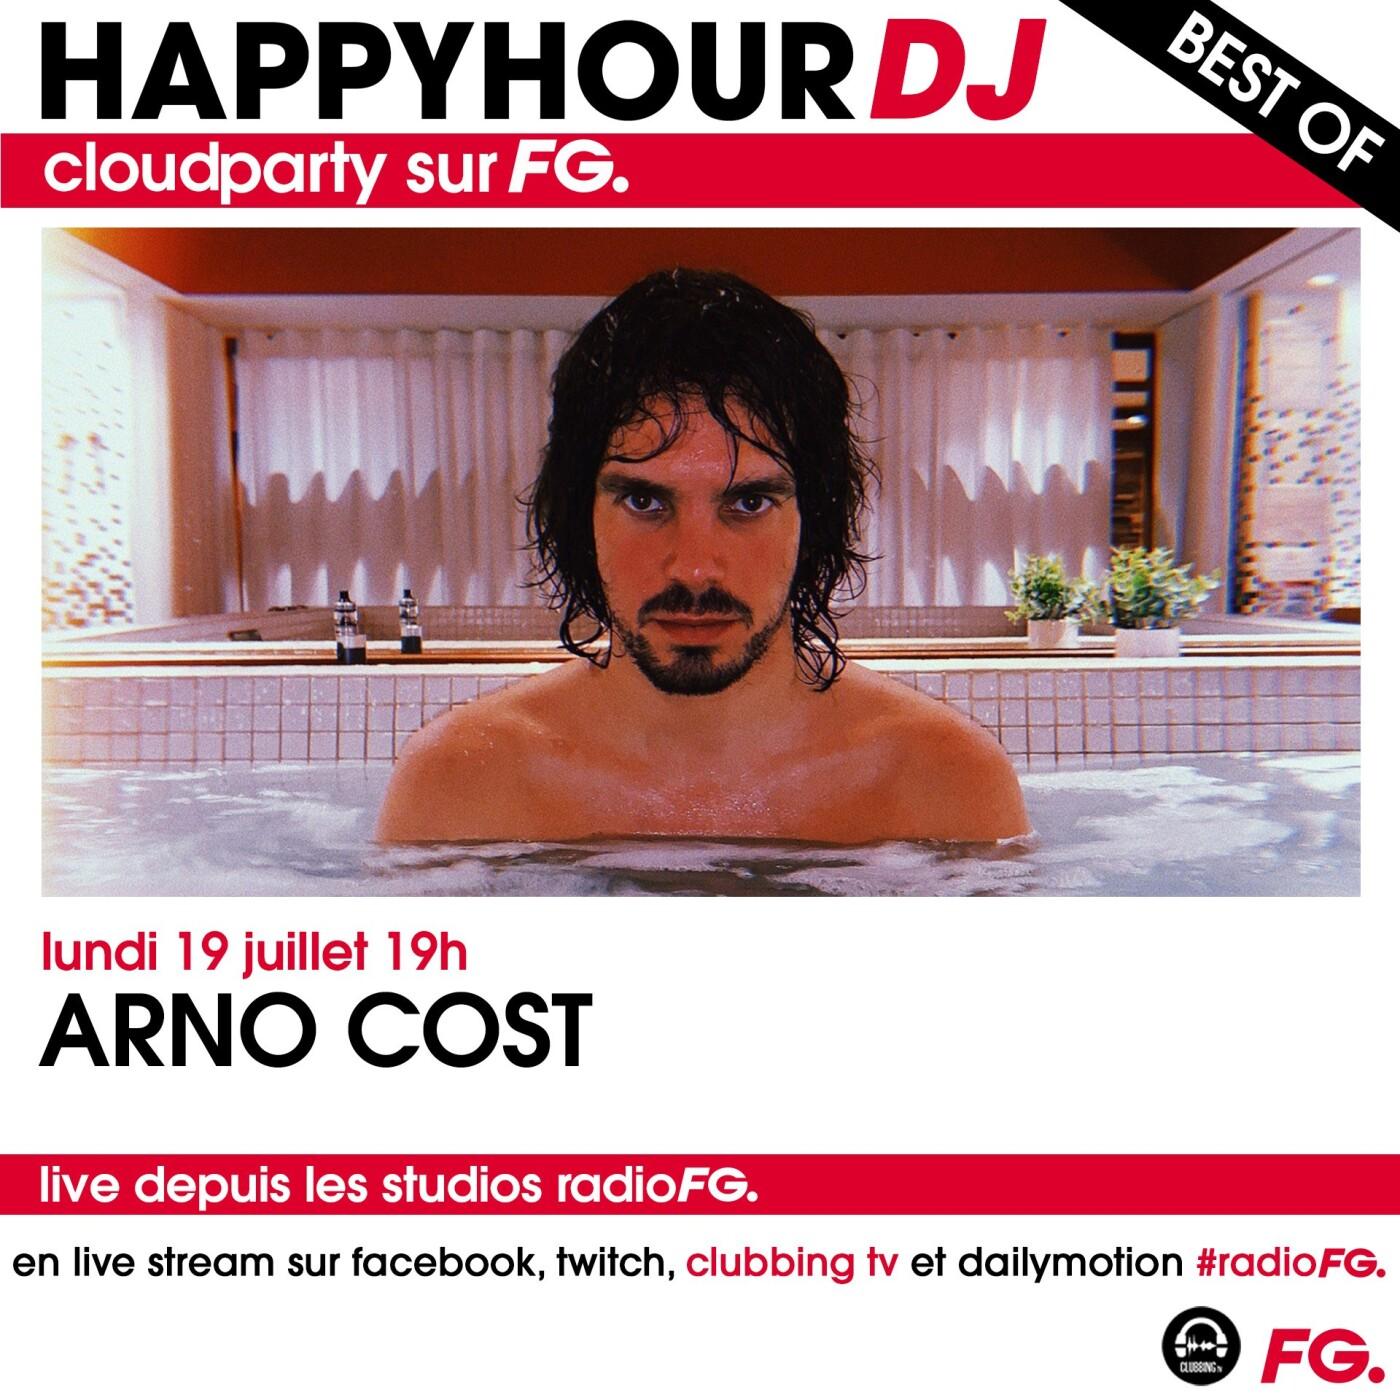 HAPPY HOUR DJ BEST OF : ARNO COST